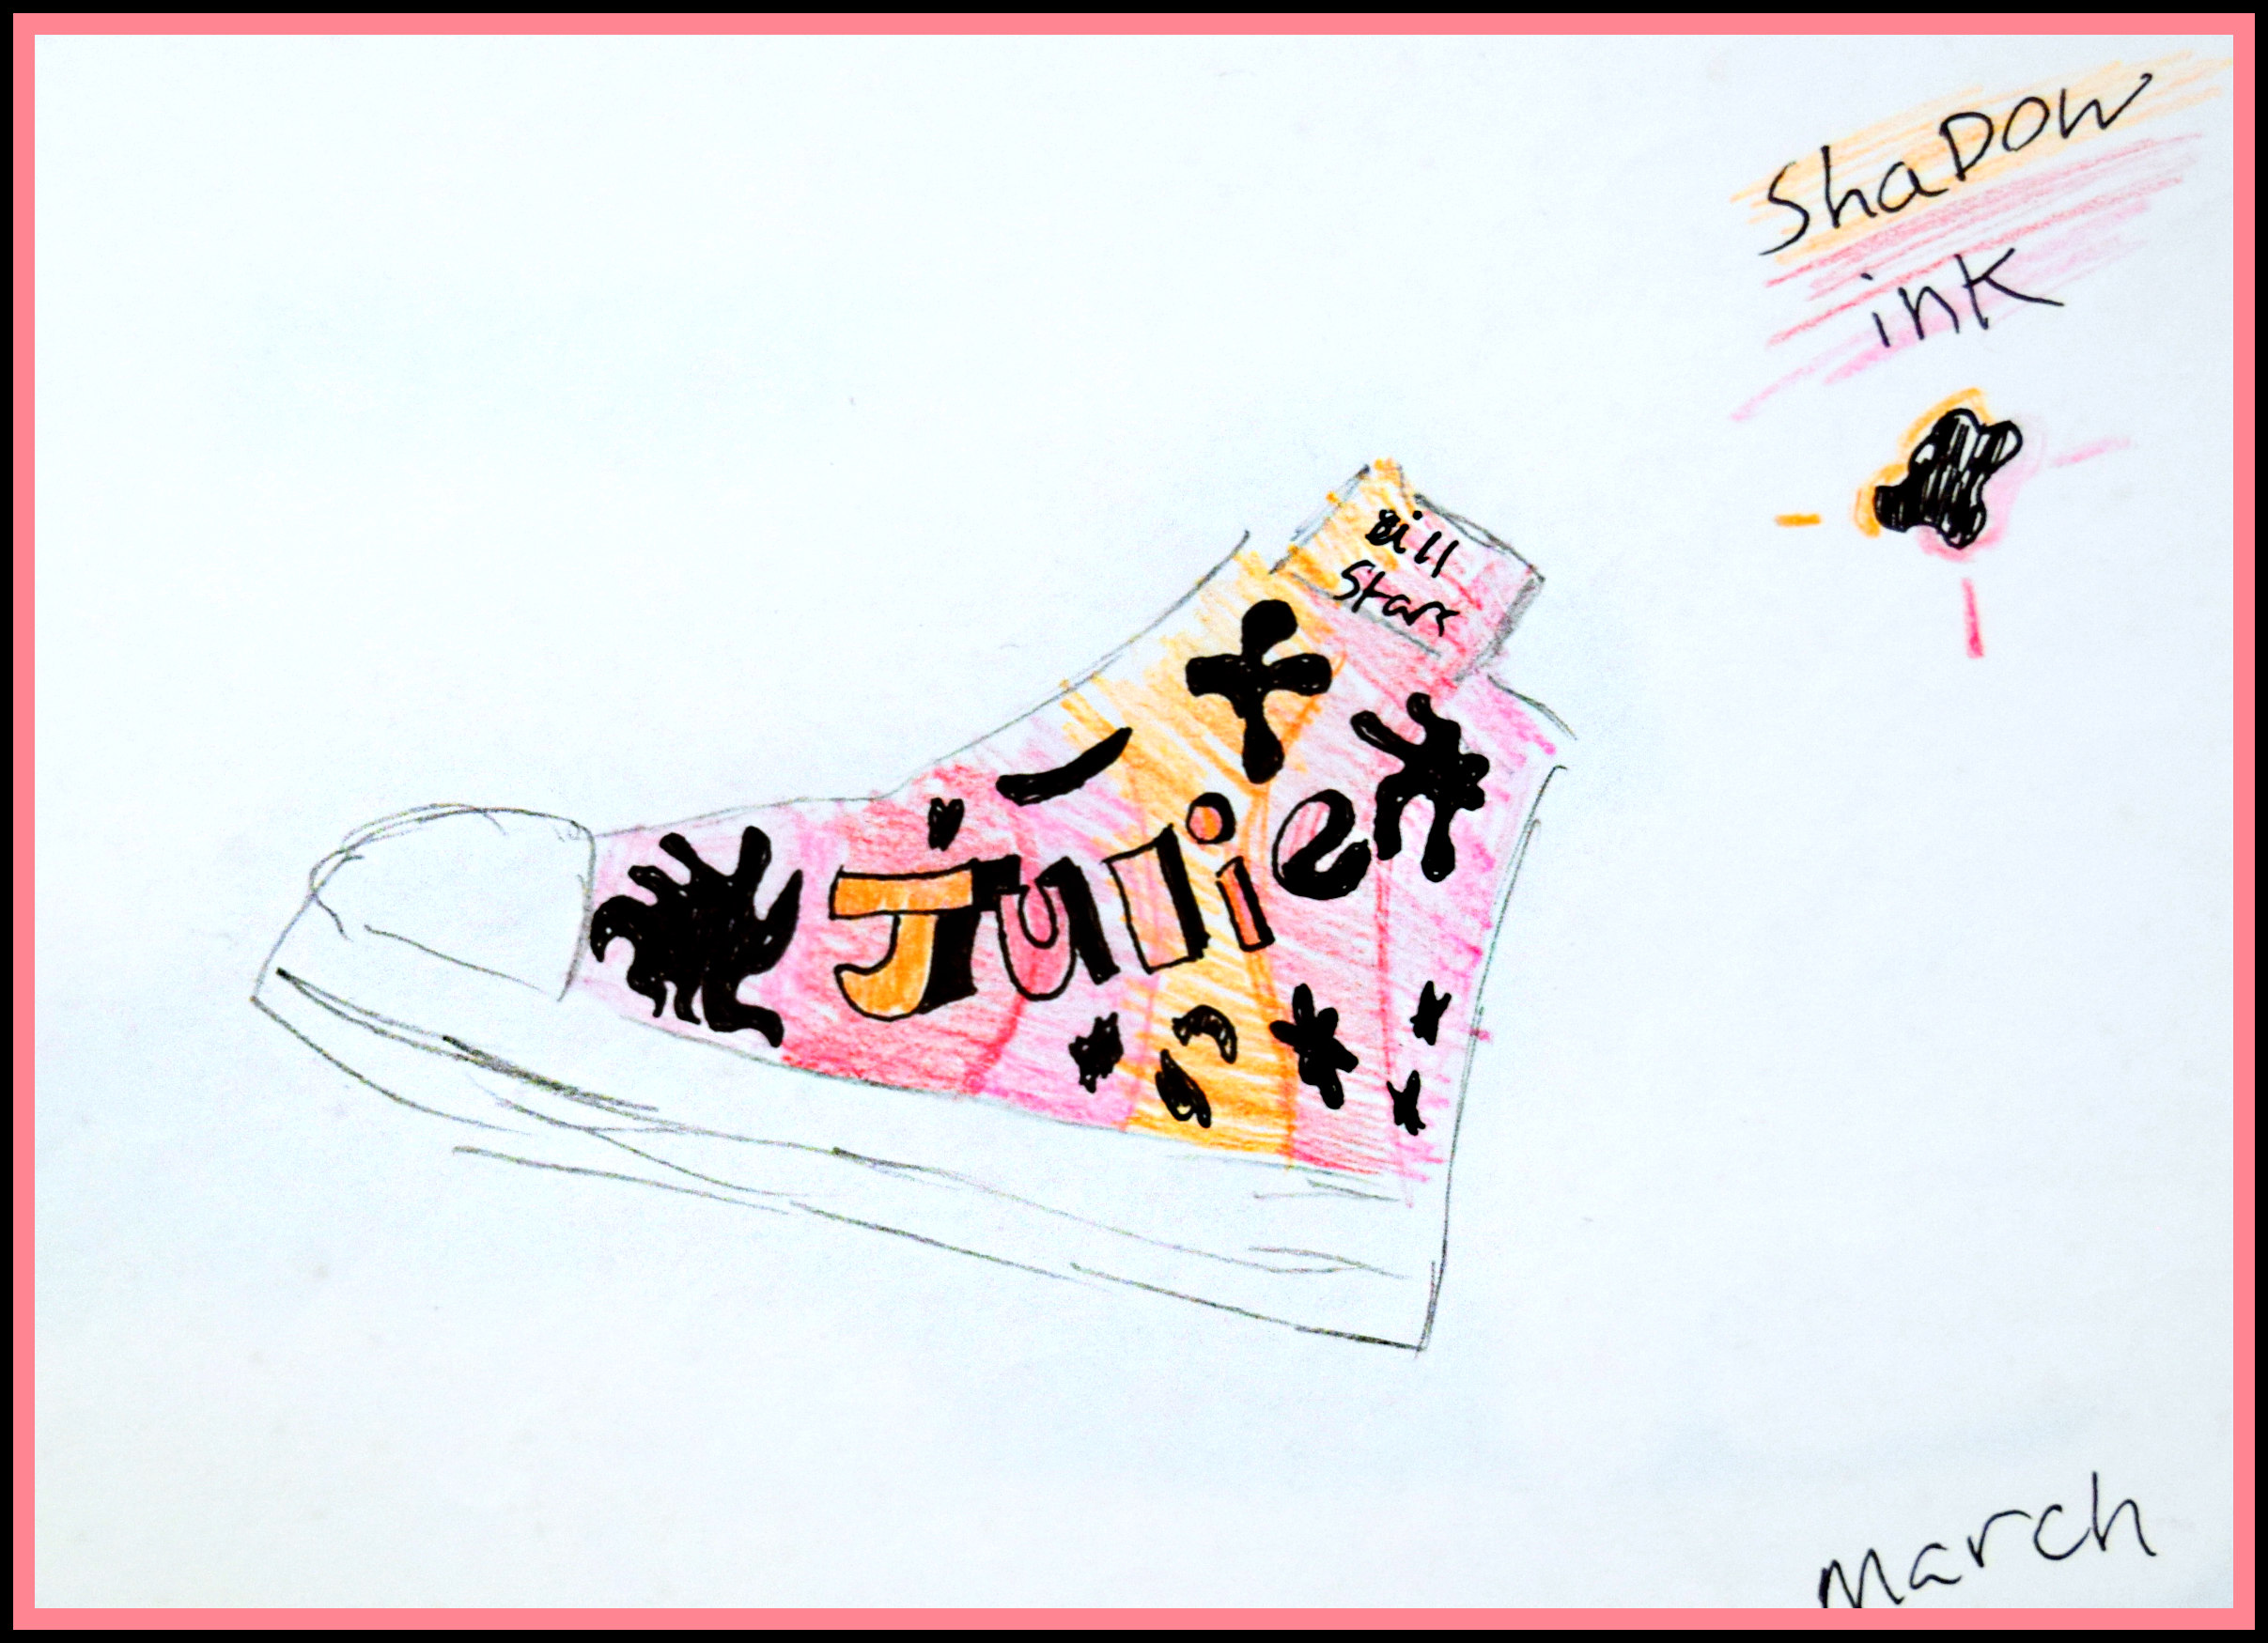 Julie's Shoe Shambria Loffer Colored Pencil Print on 8x10 $20